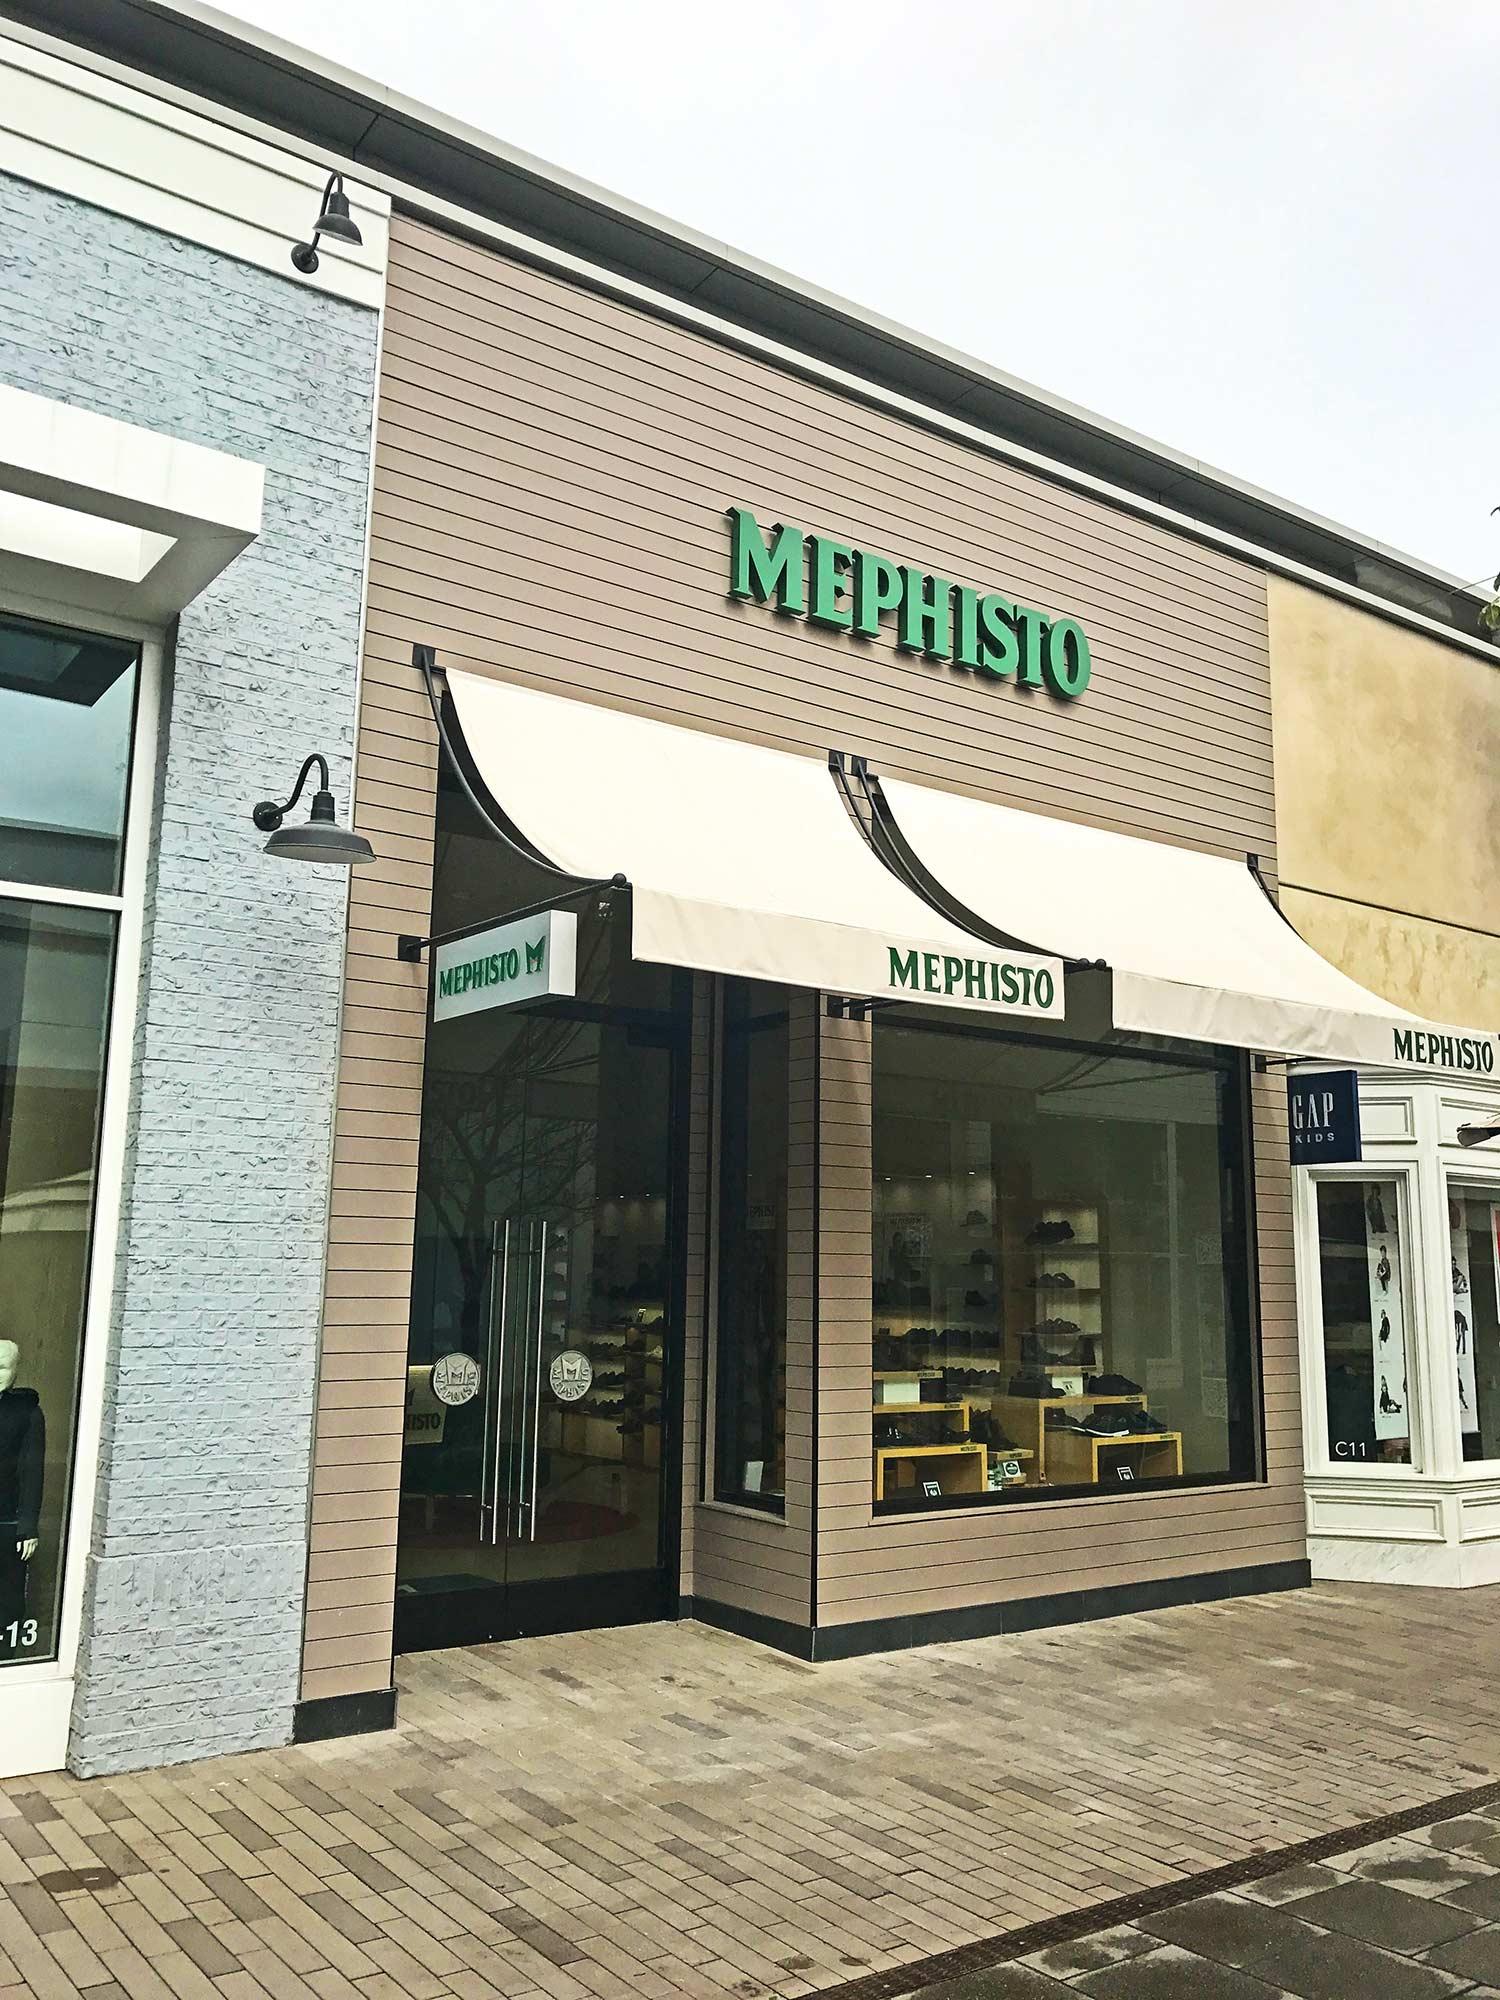 Mephisto retail store exterior